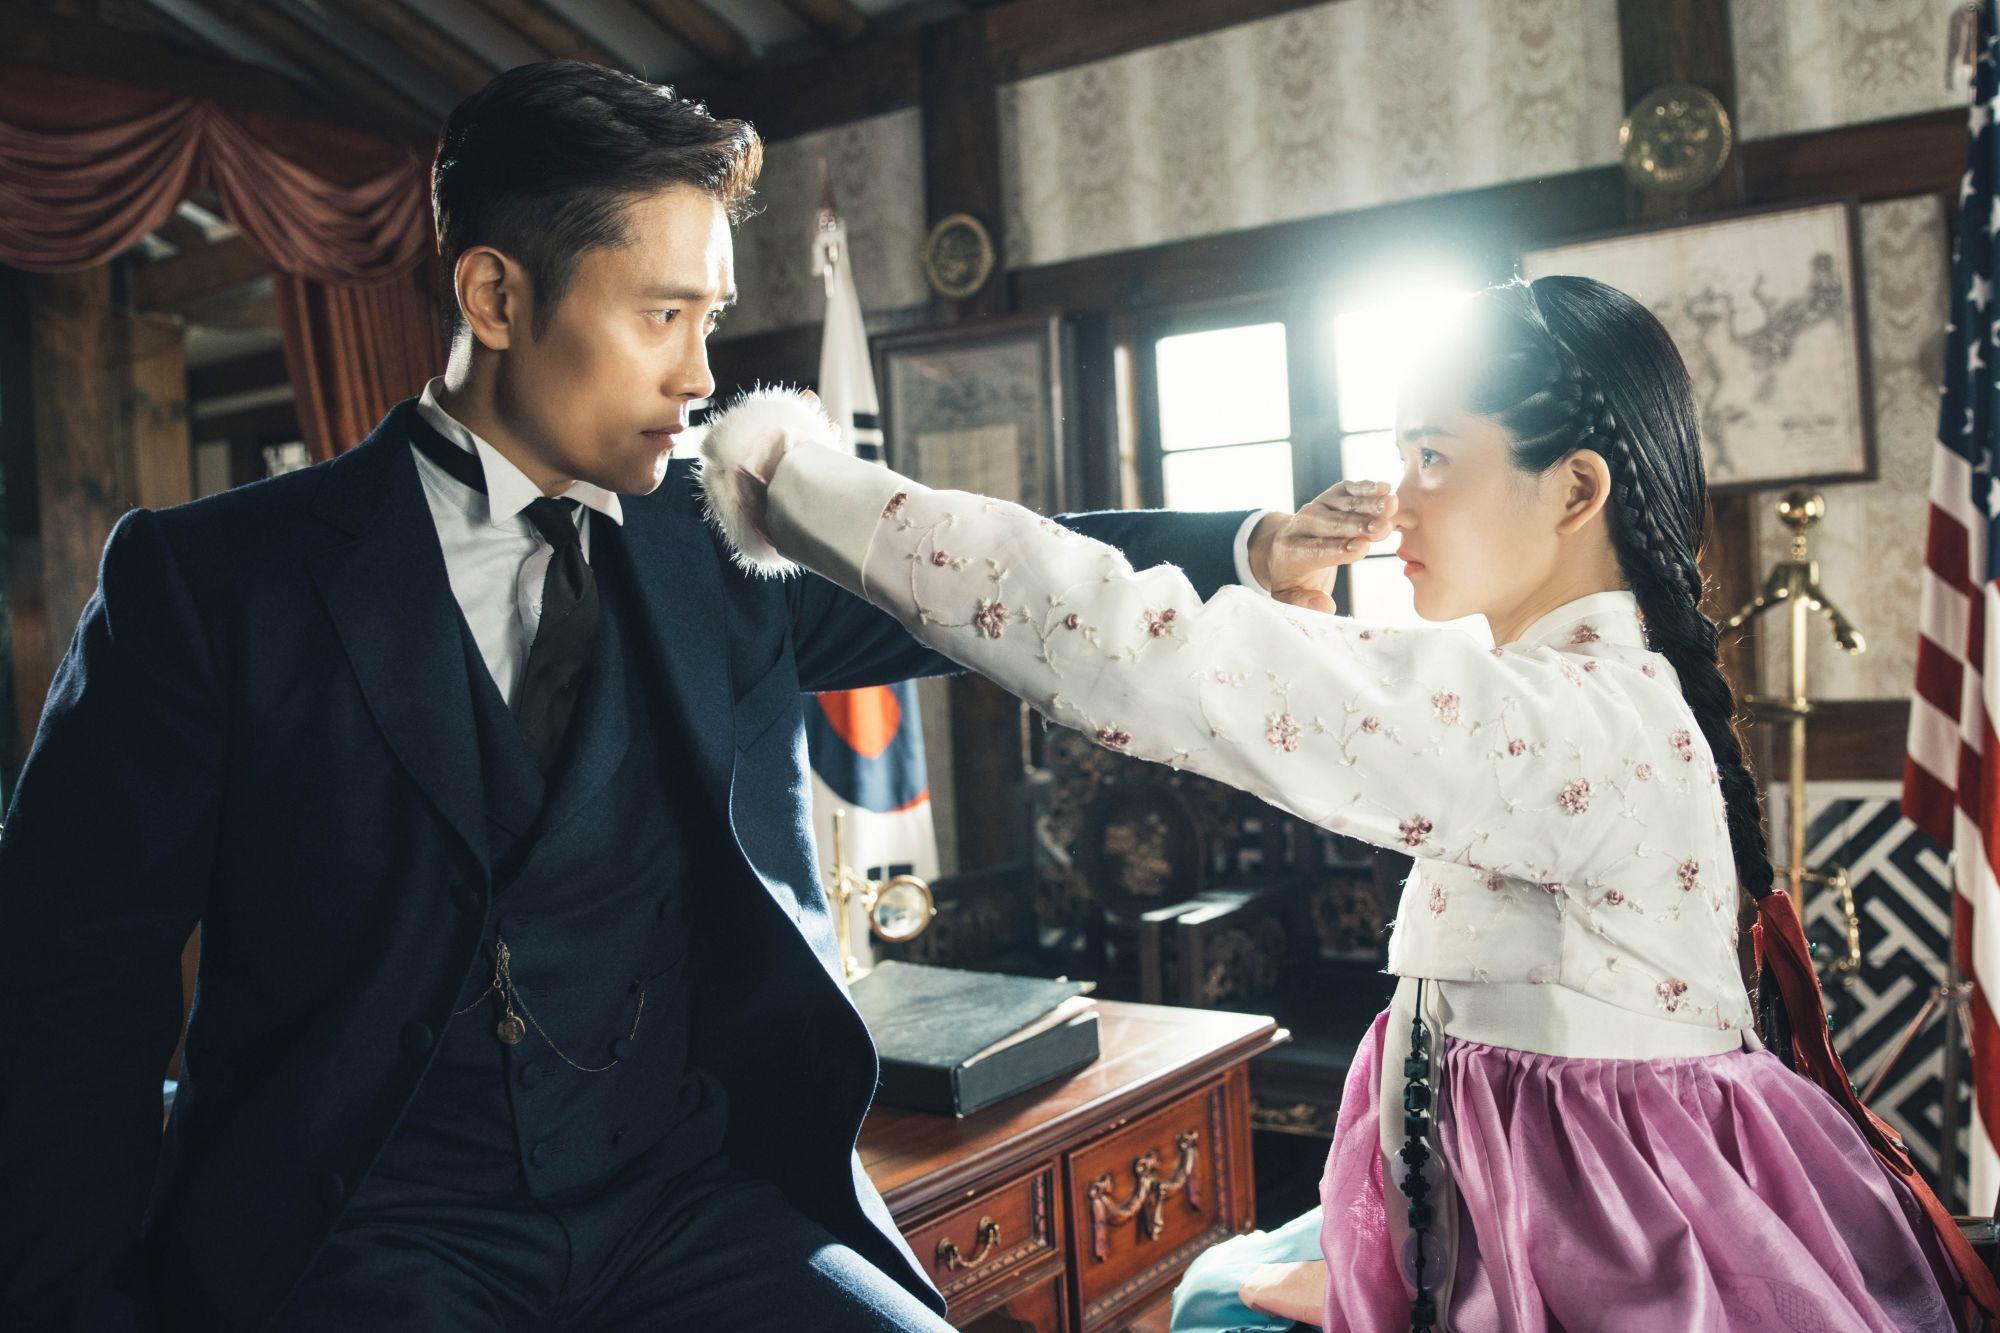 Lee Byung-hun and Kim Tae-ri in Mr. Sunshine. (Photo Courtesy of Hwa&Dam/Netflix)